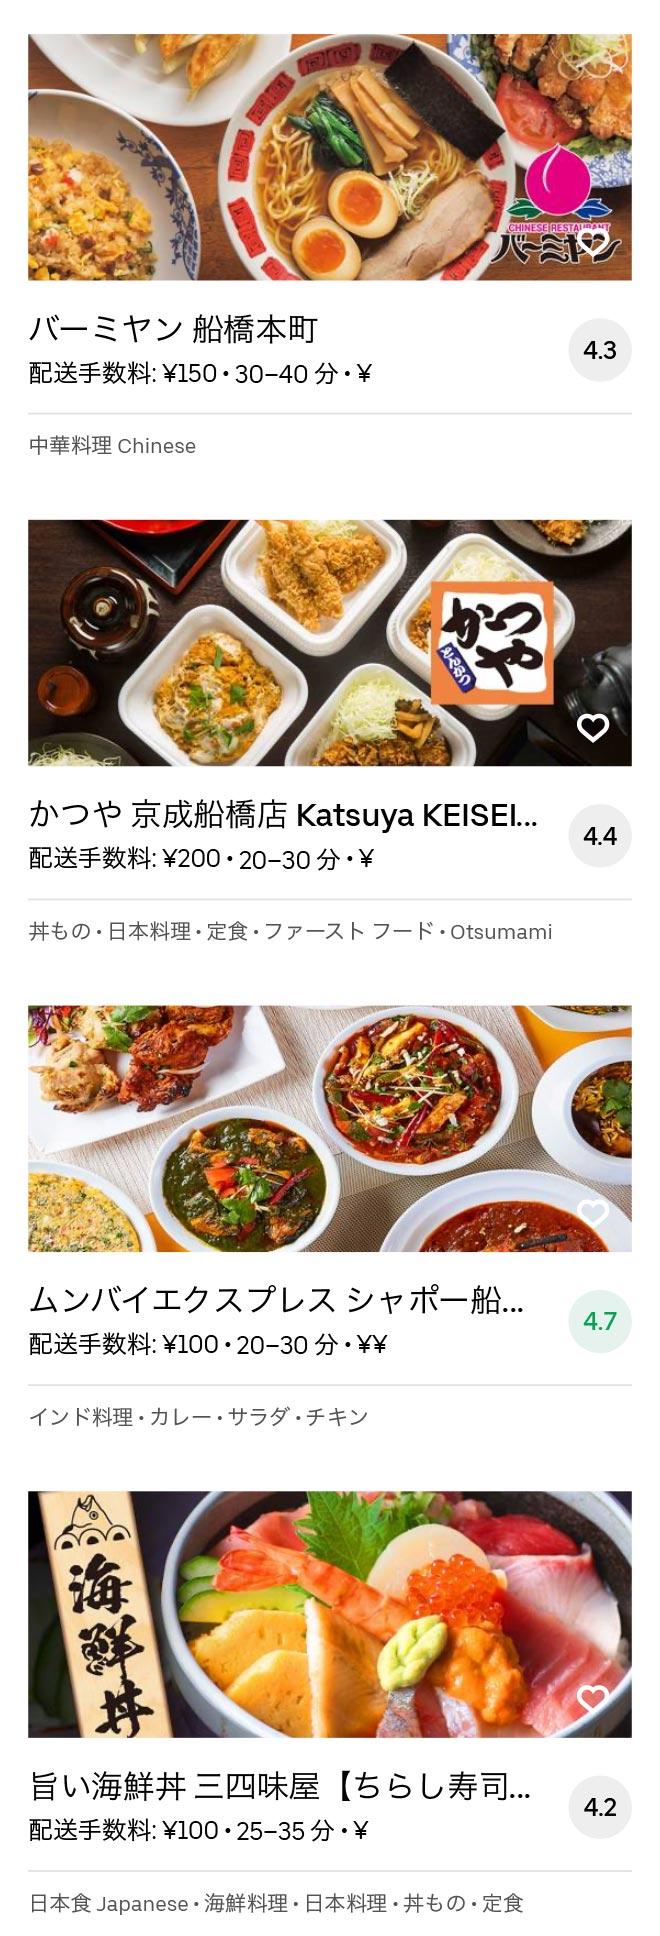 Funabashi menu 2008 06